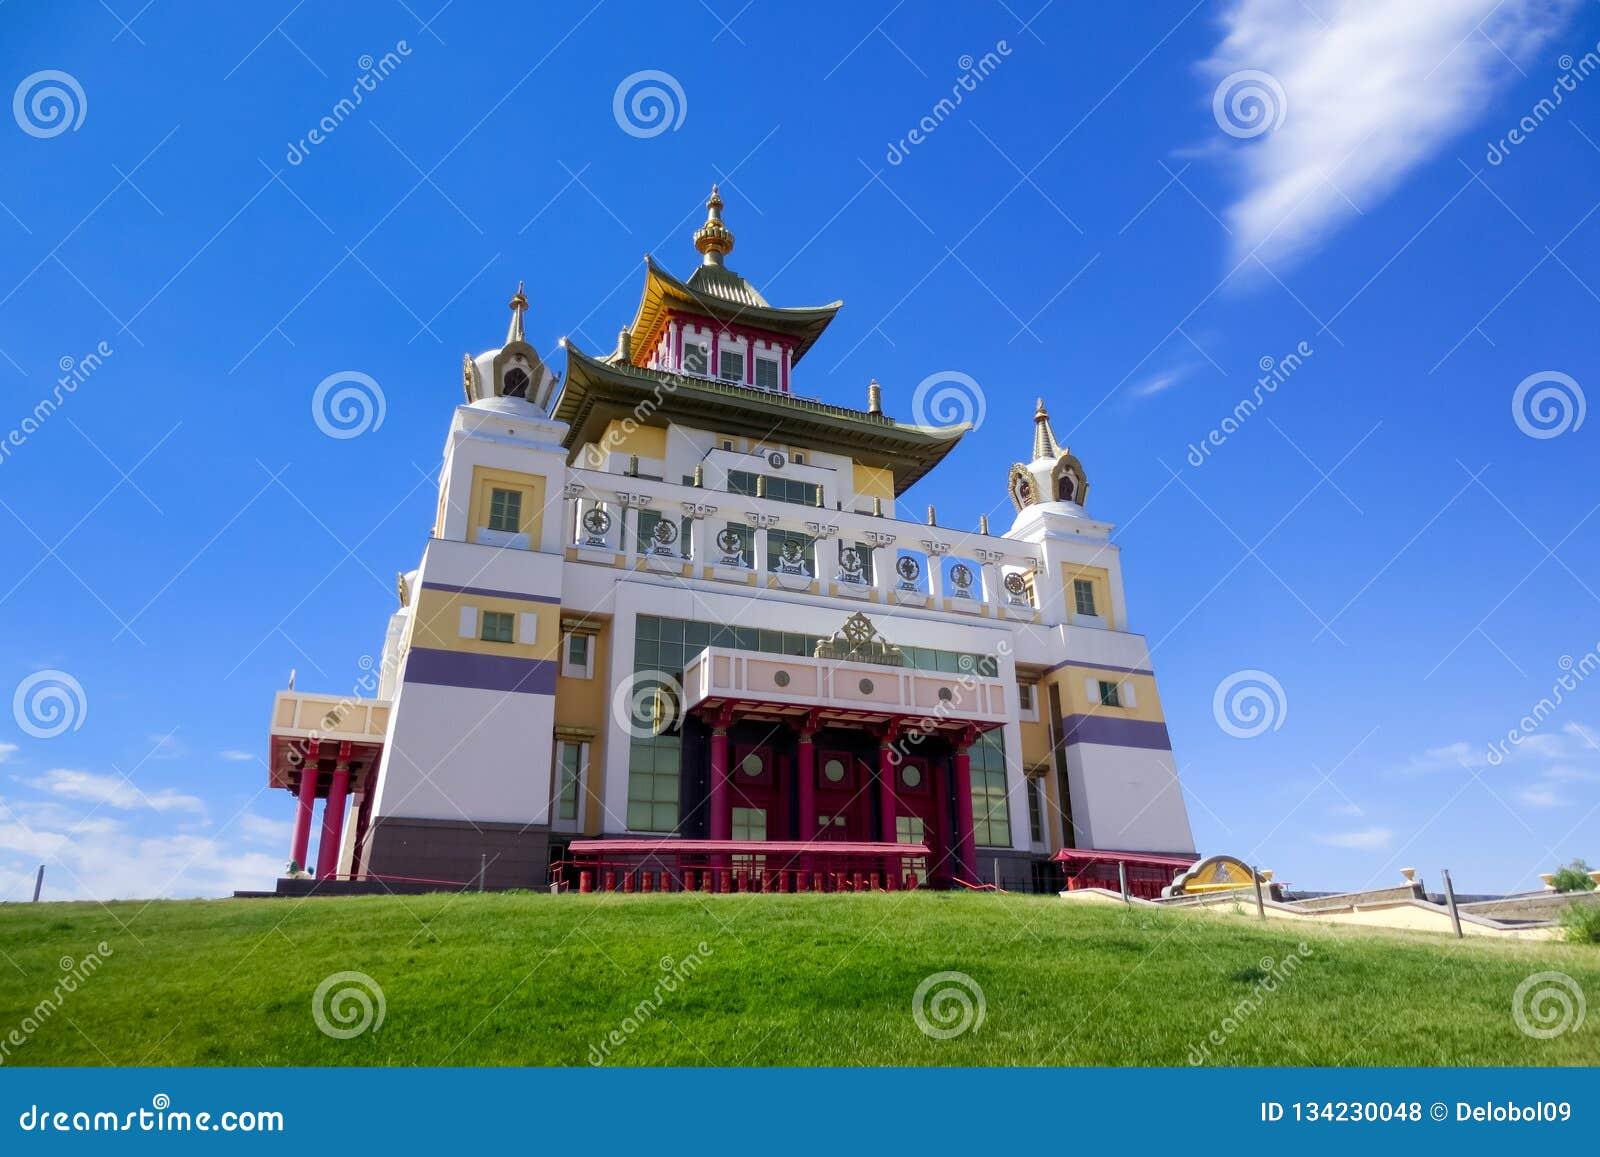 Domicílio dourado da Buda Shakyamuni, templo budista em Elista